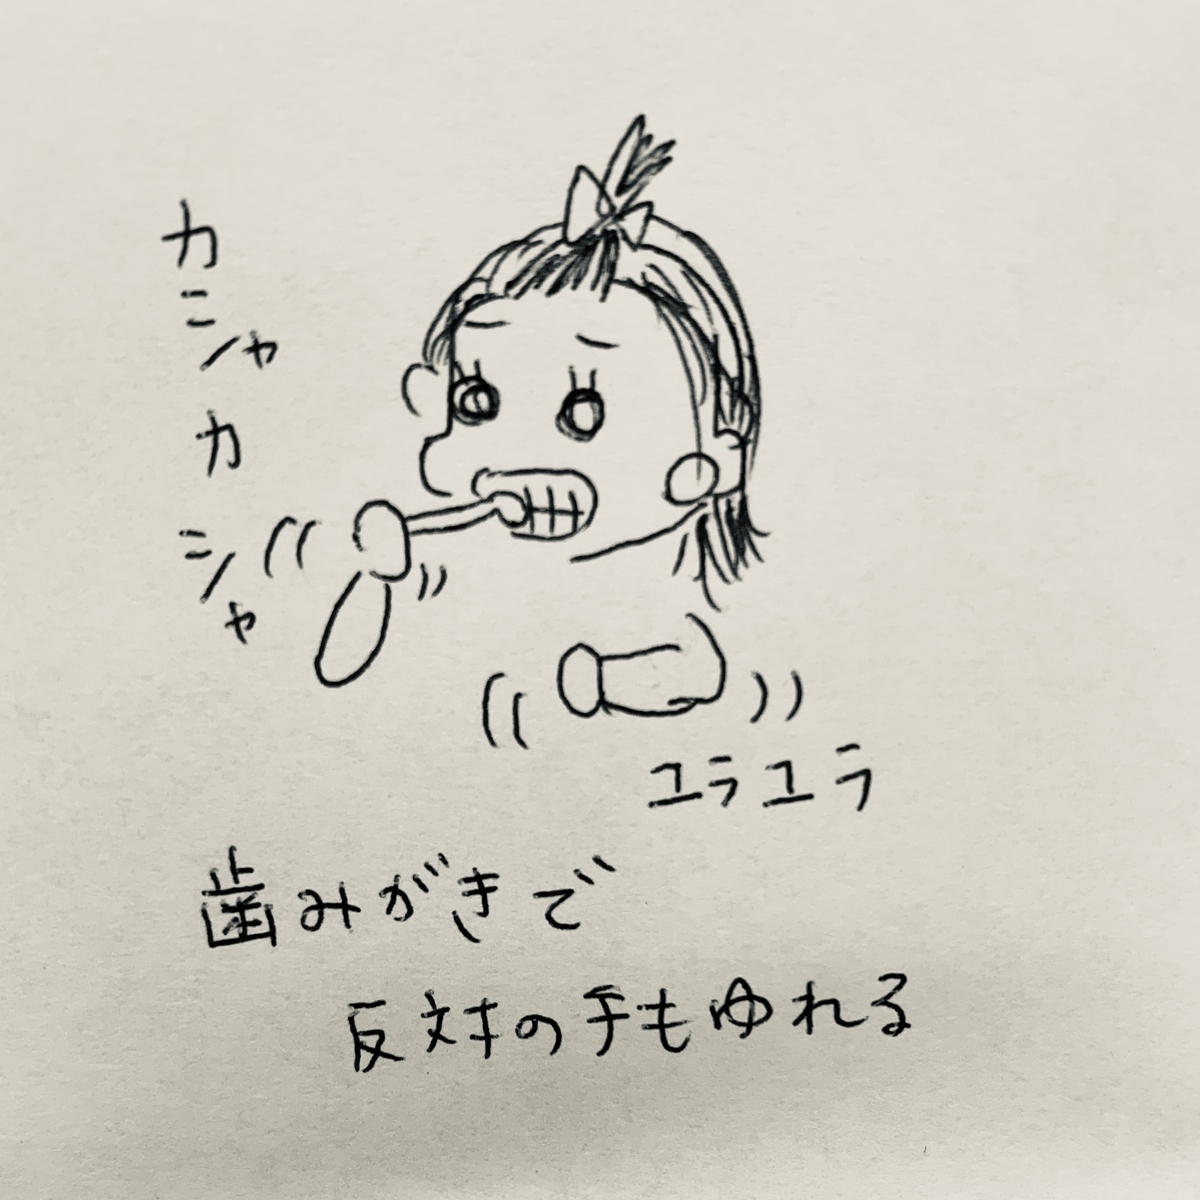 f:id:nananan0:20190513134807j:plain